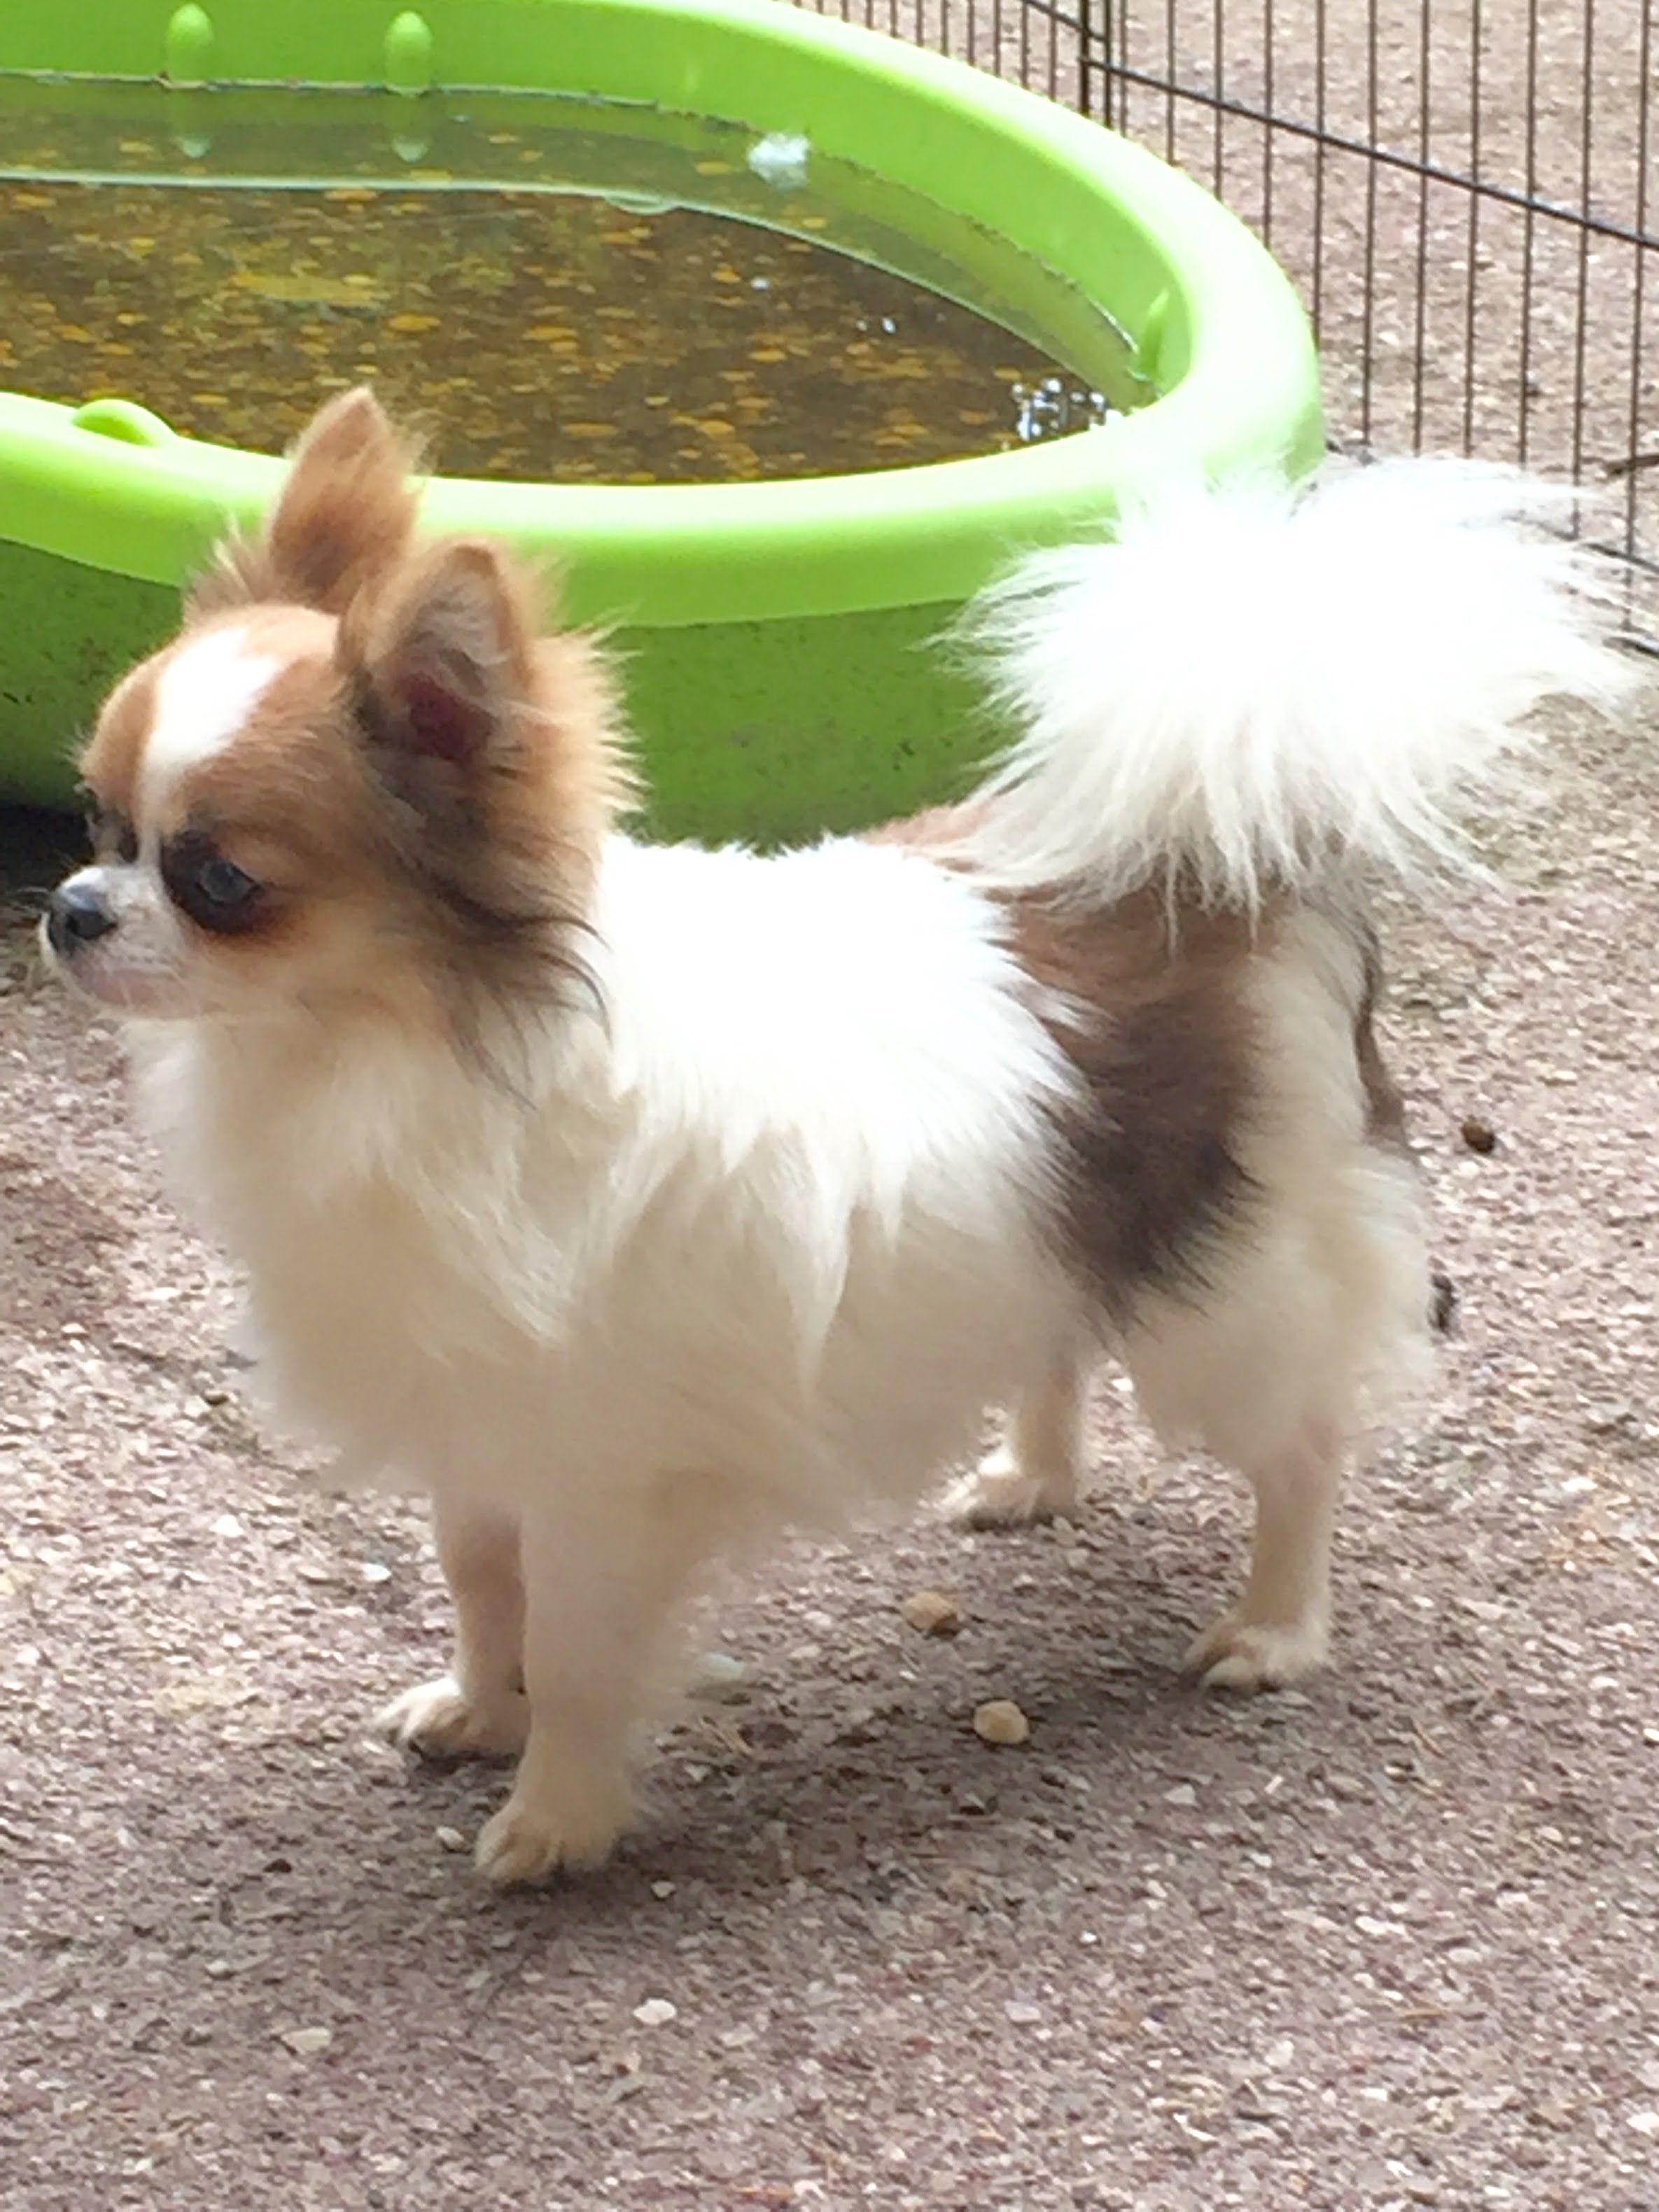 Elevage Chihuahuas Des Petits Azteques Chihuahua Poil Long Prix